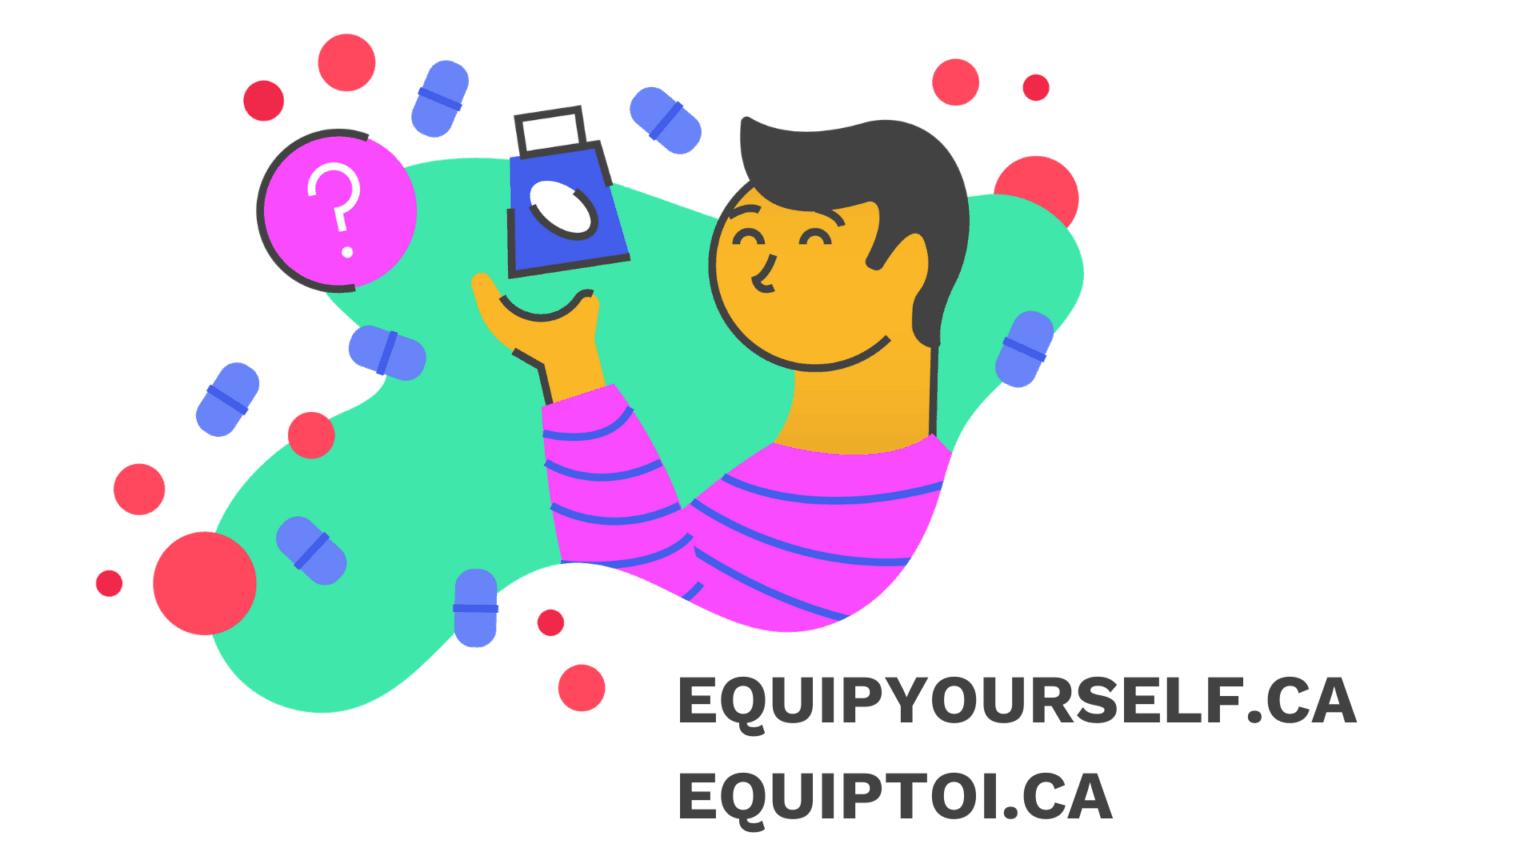 Equip Yourself logo